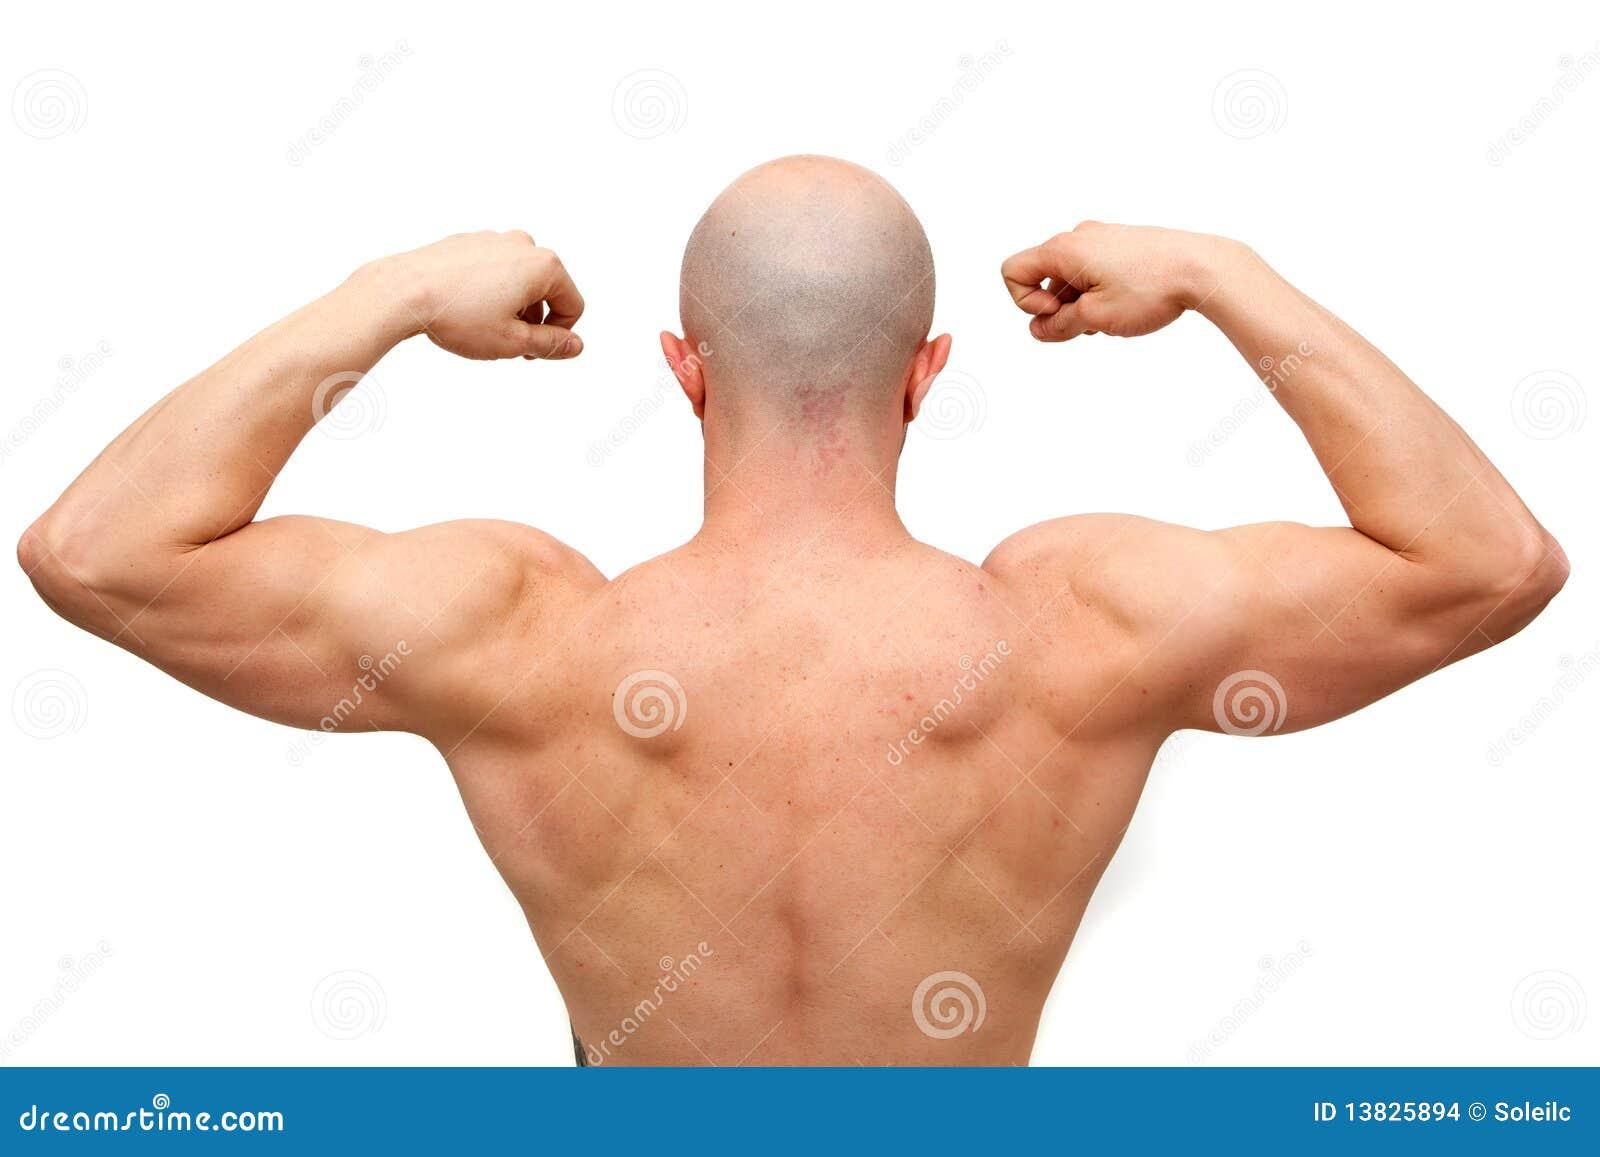 Http Www Dreamstime Com Stock Images Body Builder Back Image13825894